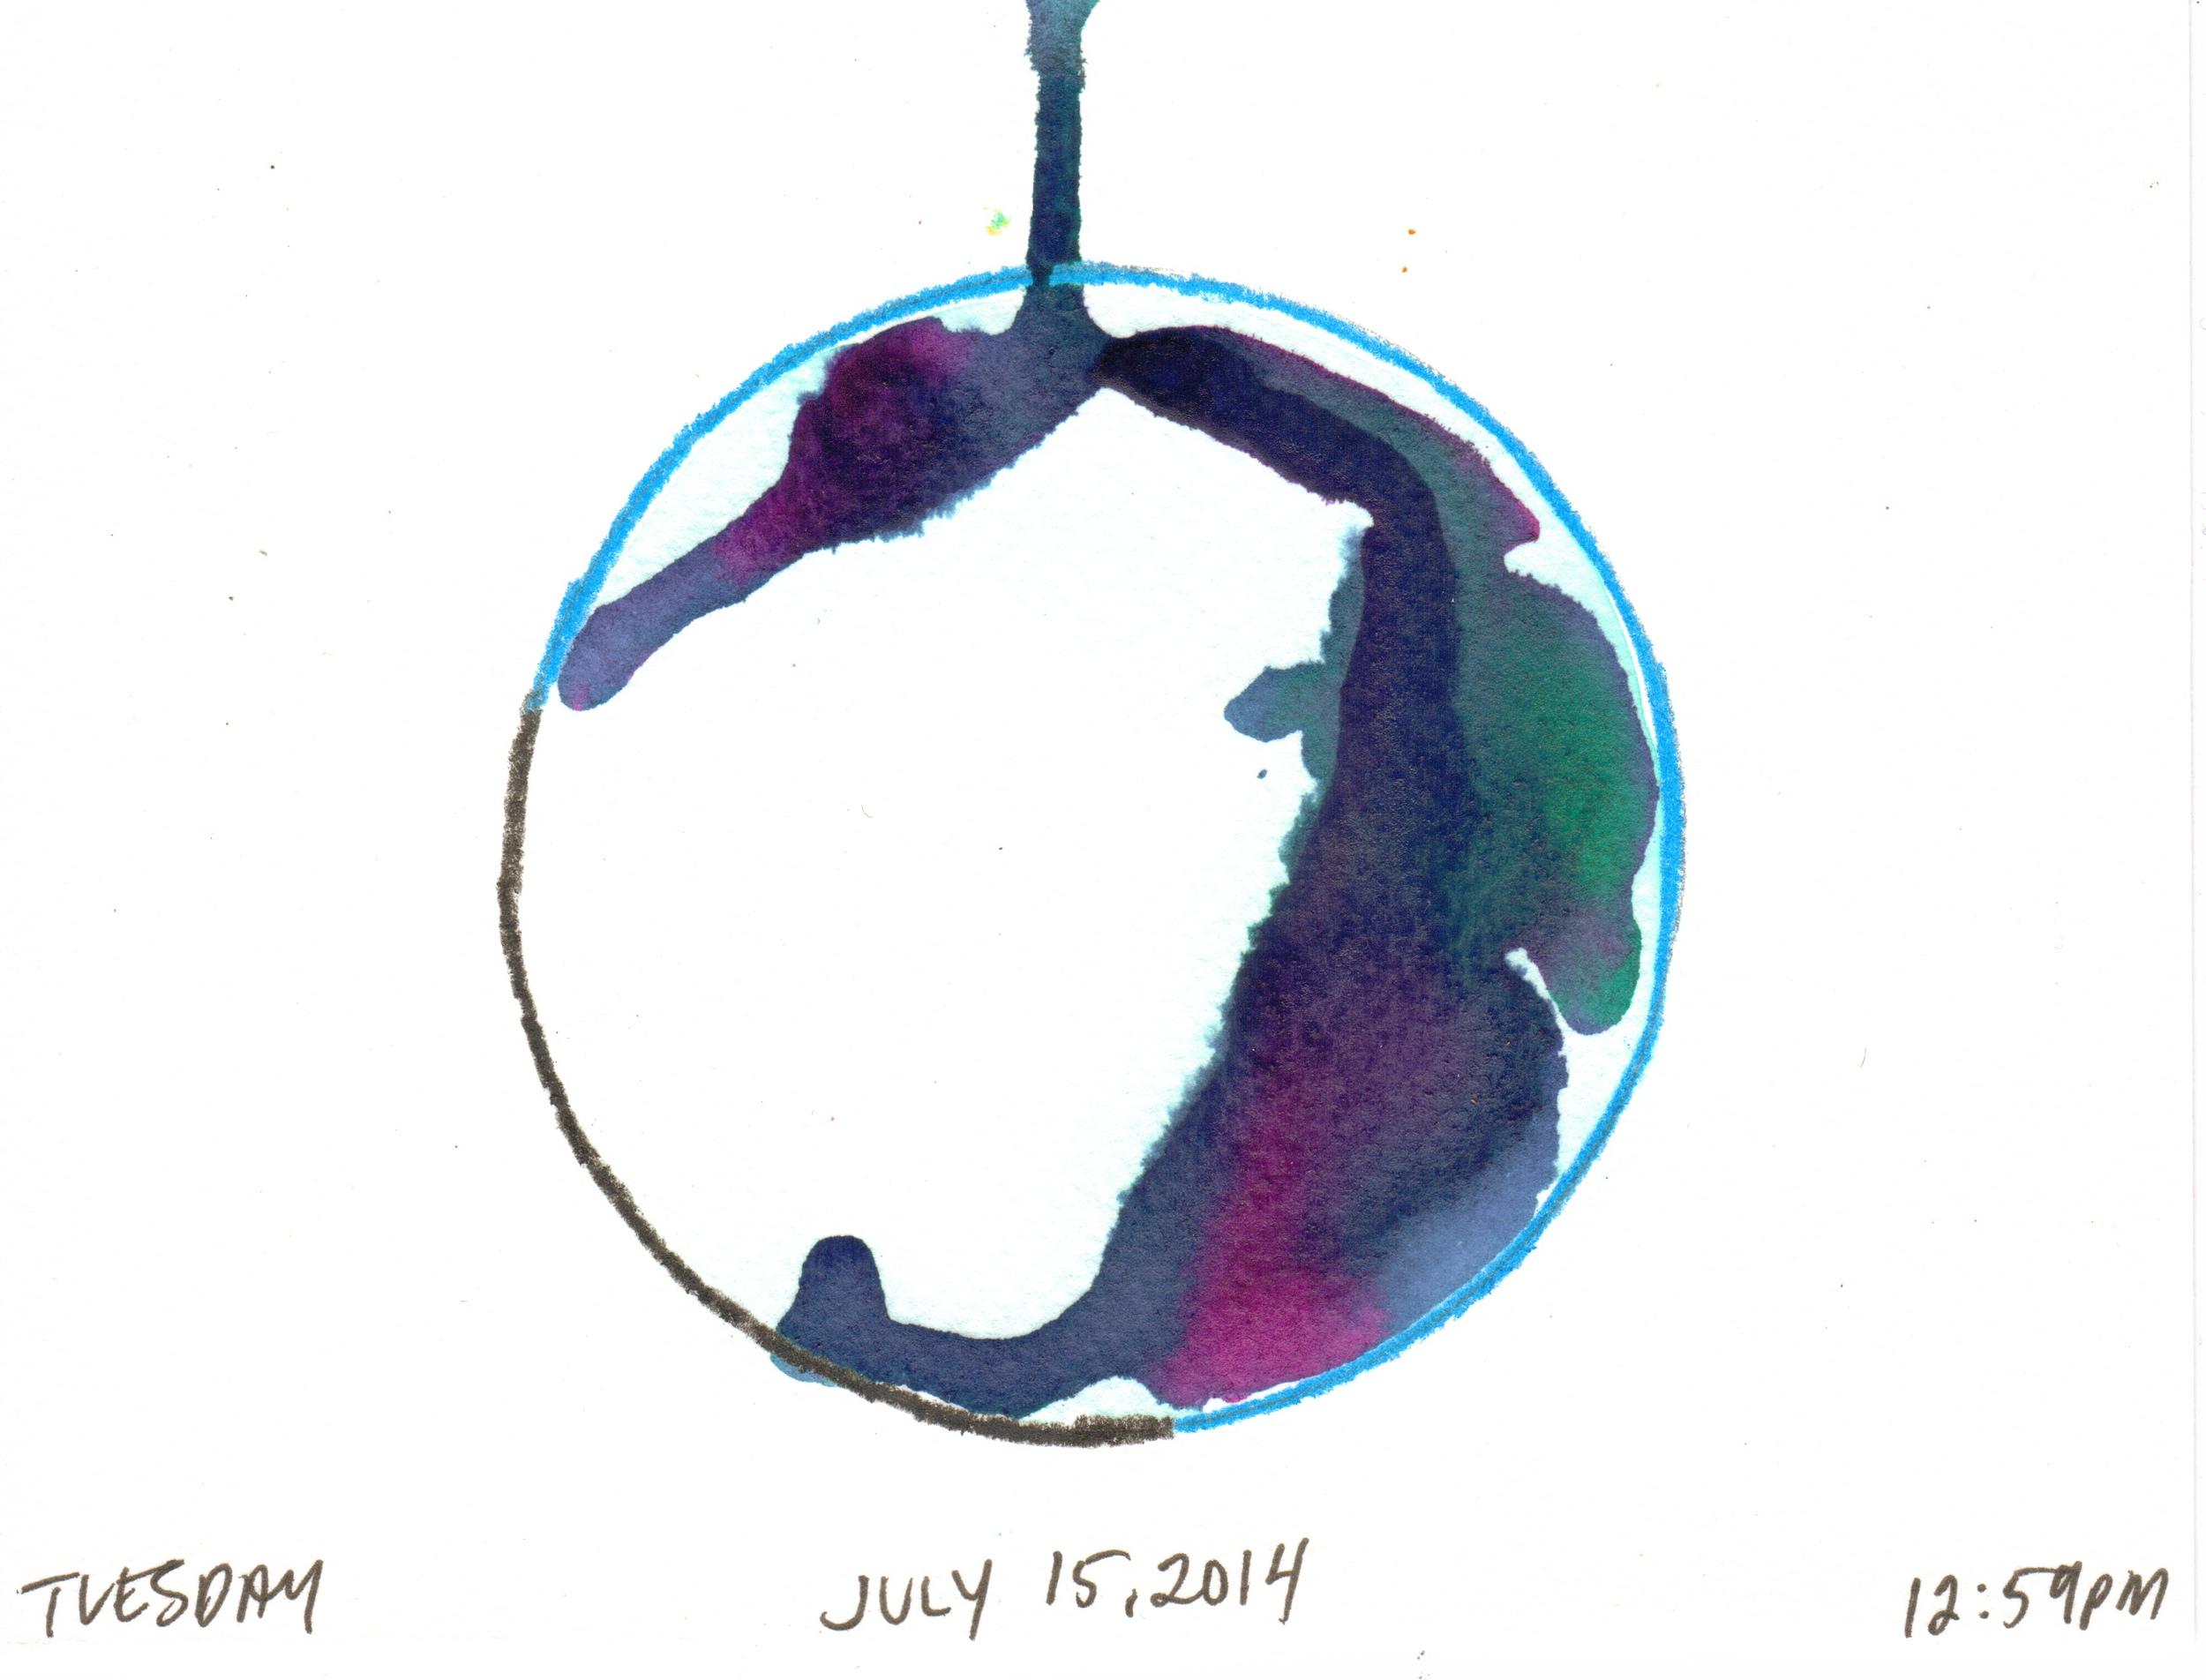 07.15.14